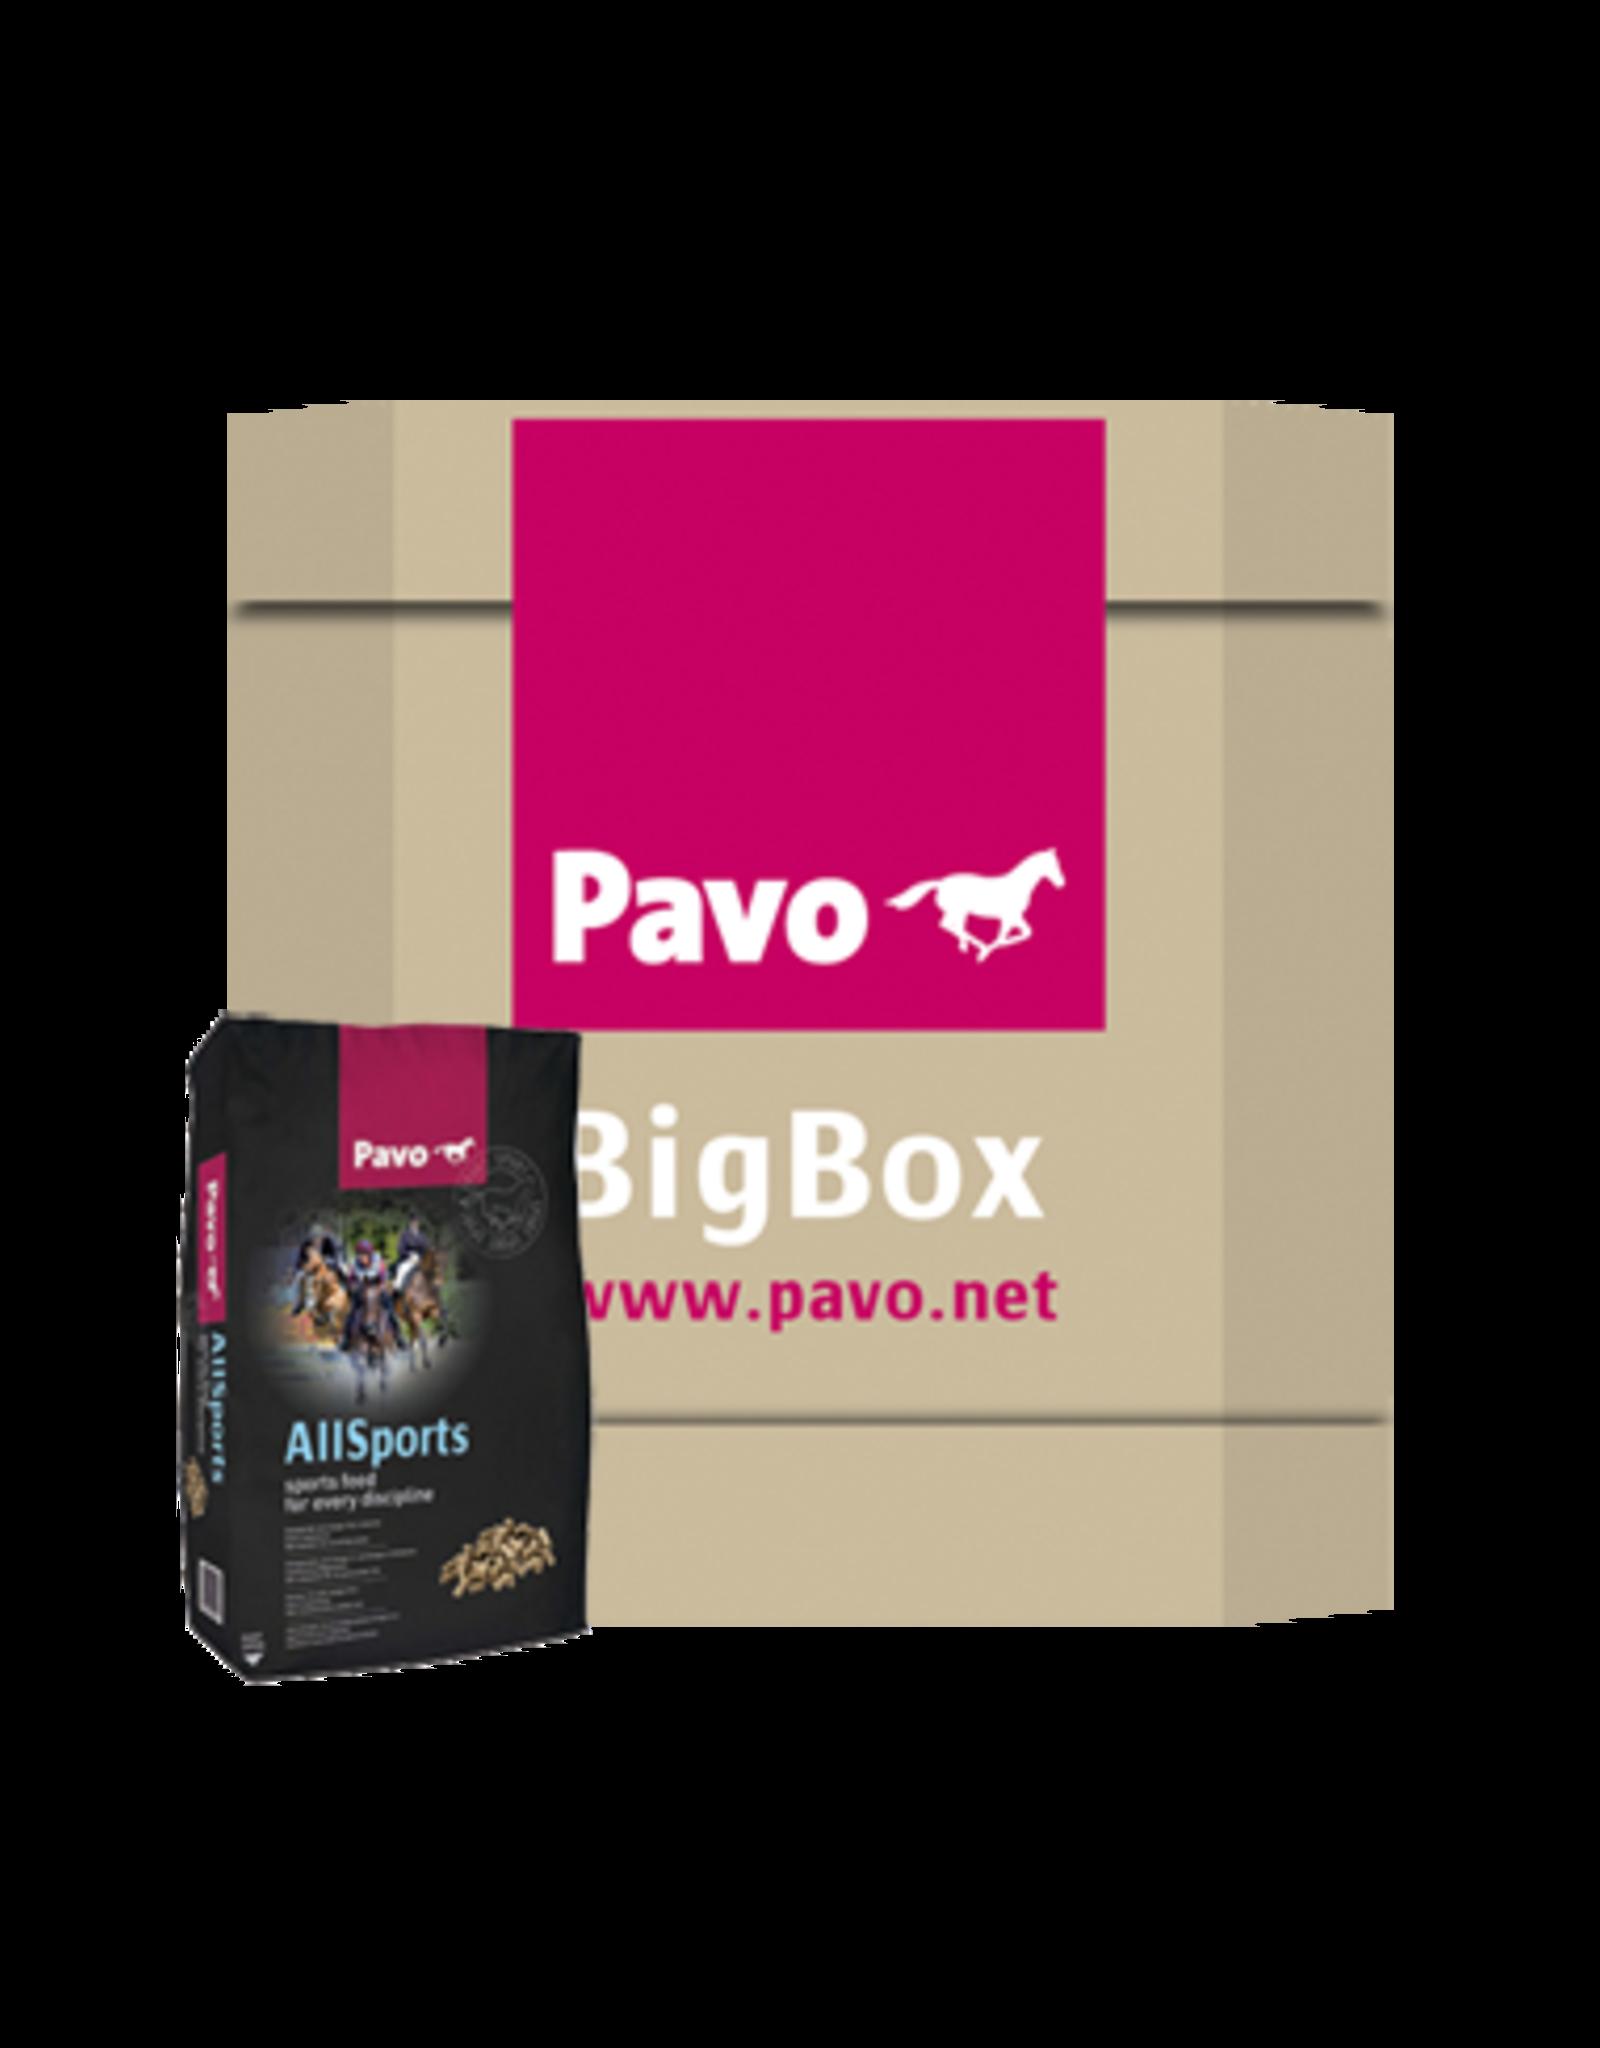 Pavo Pavo AllSports Big Box 725 kg